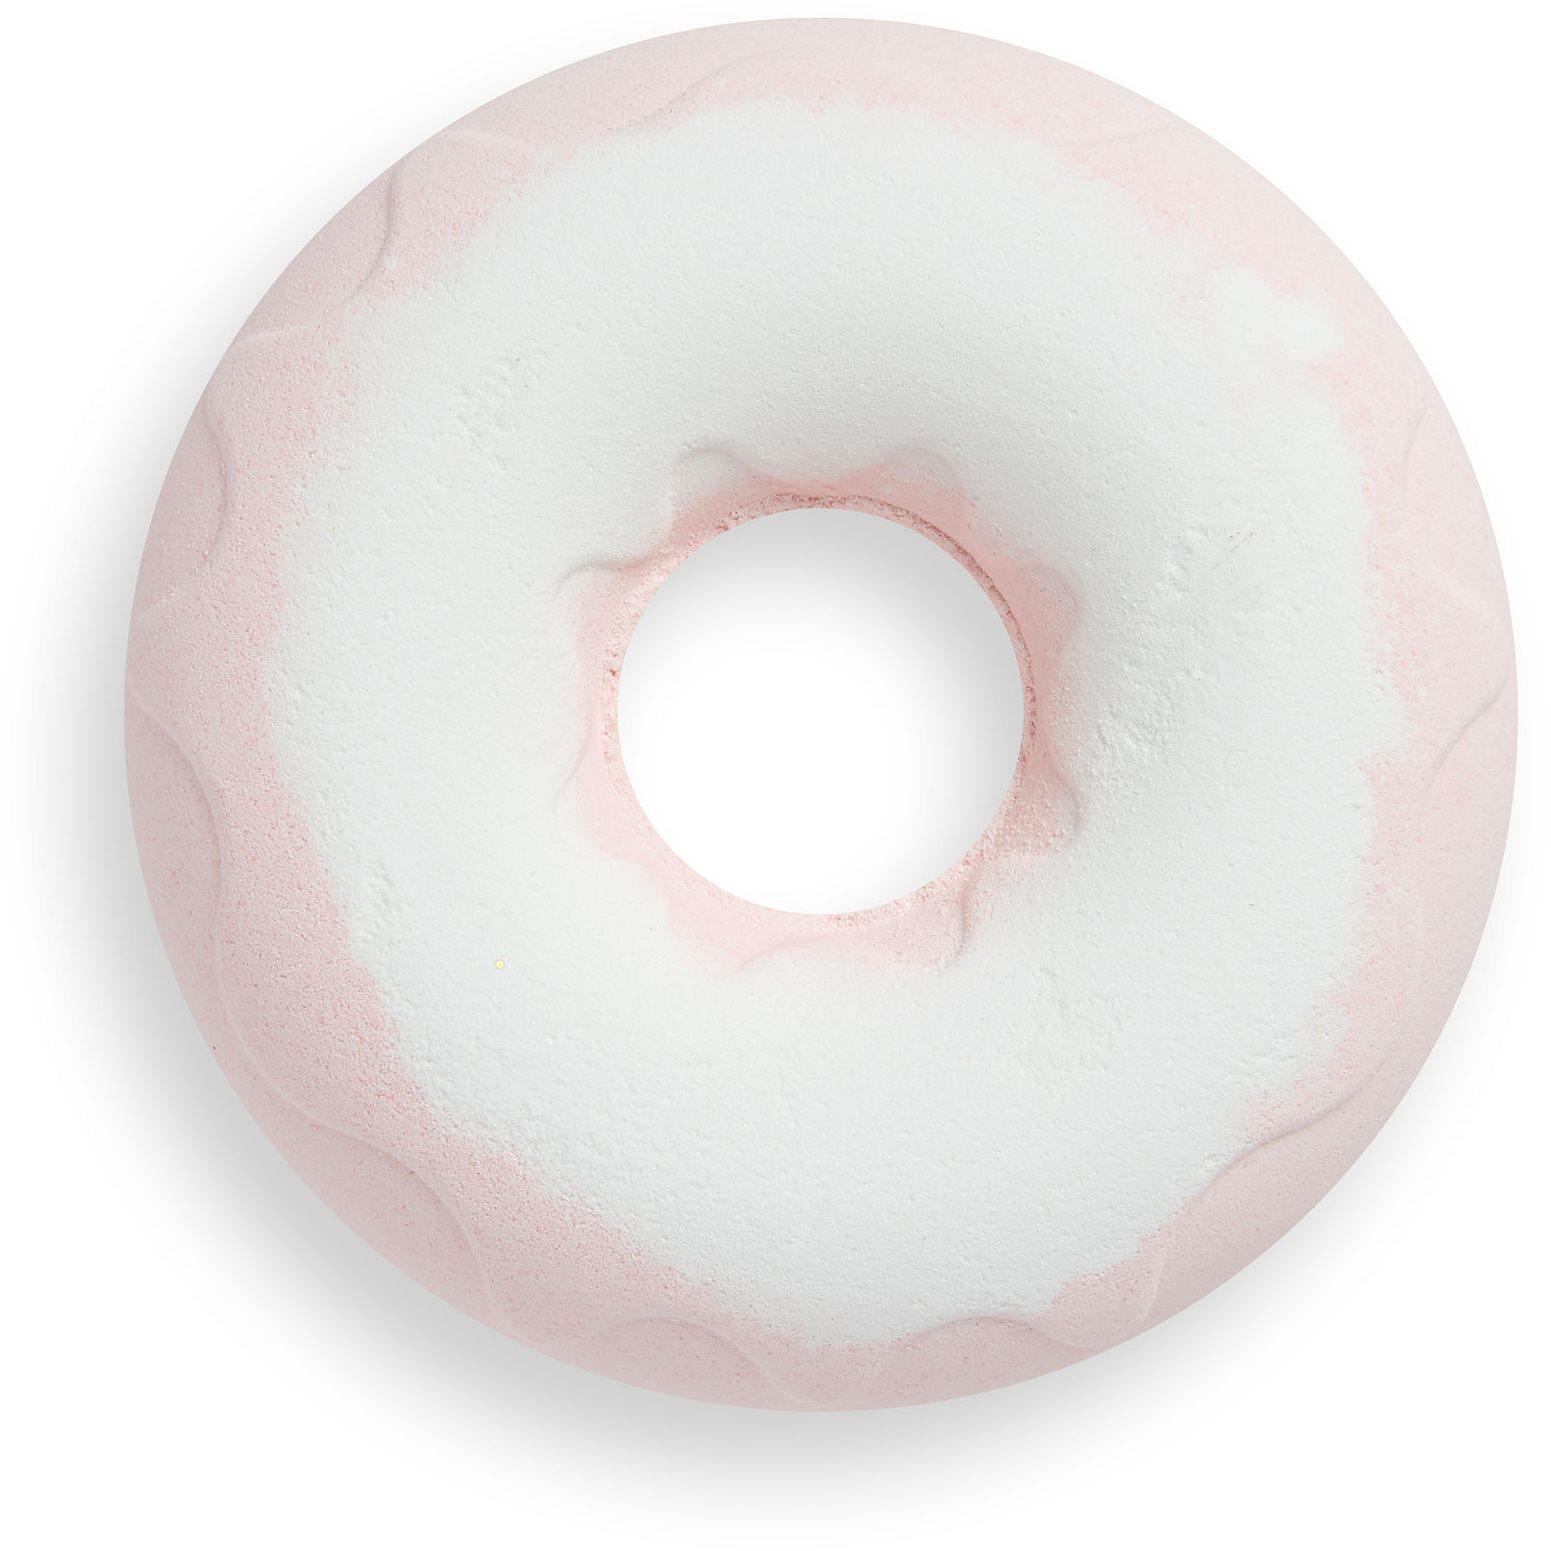 I HEART REVOLUTION Cotton Candy Donut 150 g